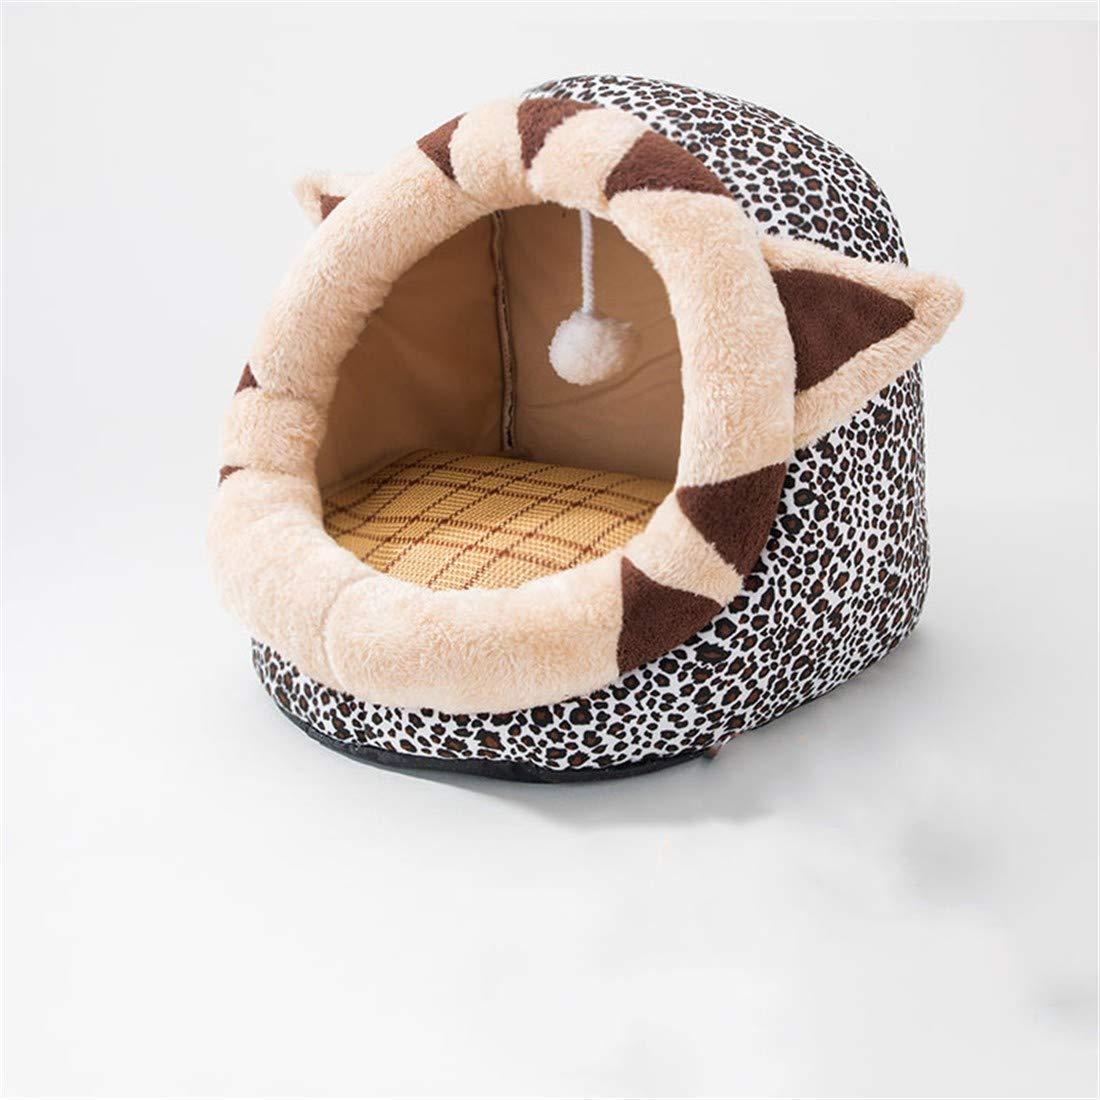 L 58X42X39cm WUTOLUO Cat litter cat sleeping bag four seasons universal pet supplies (color   L 58X42X39cm)